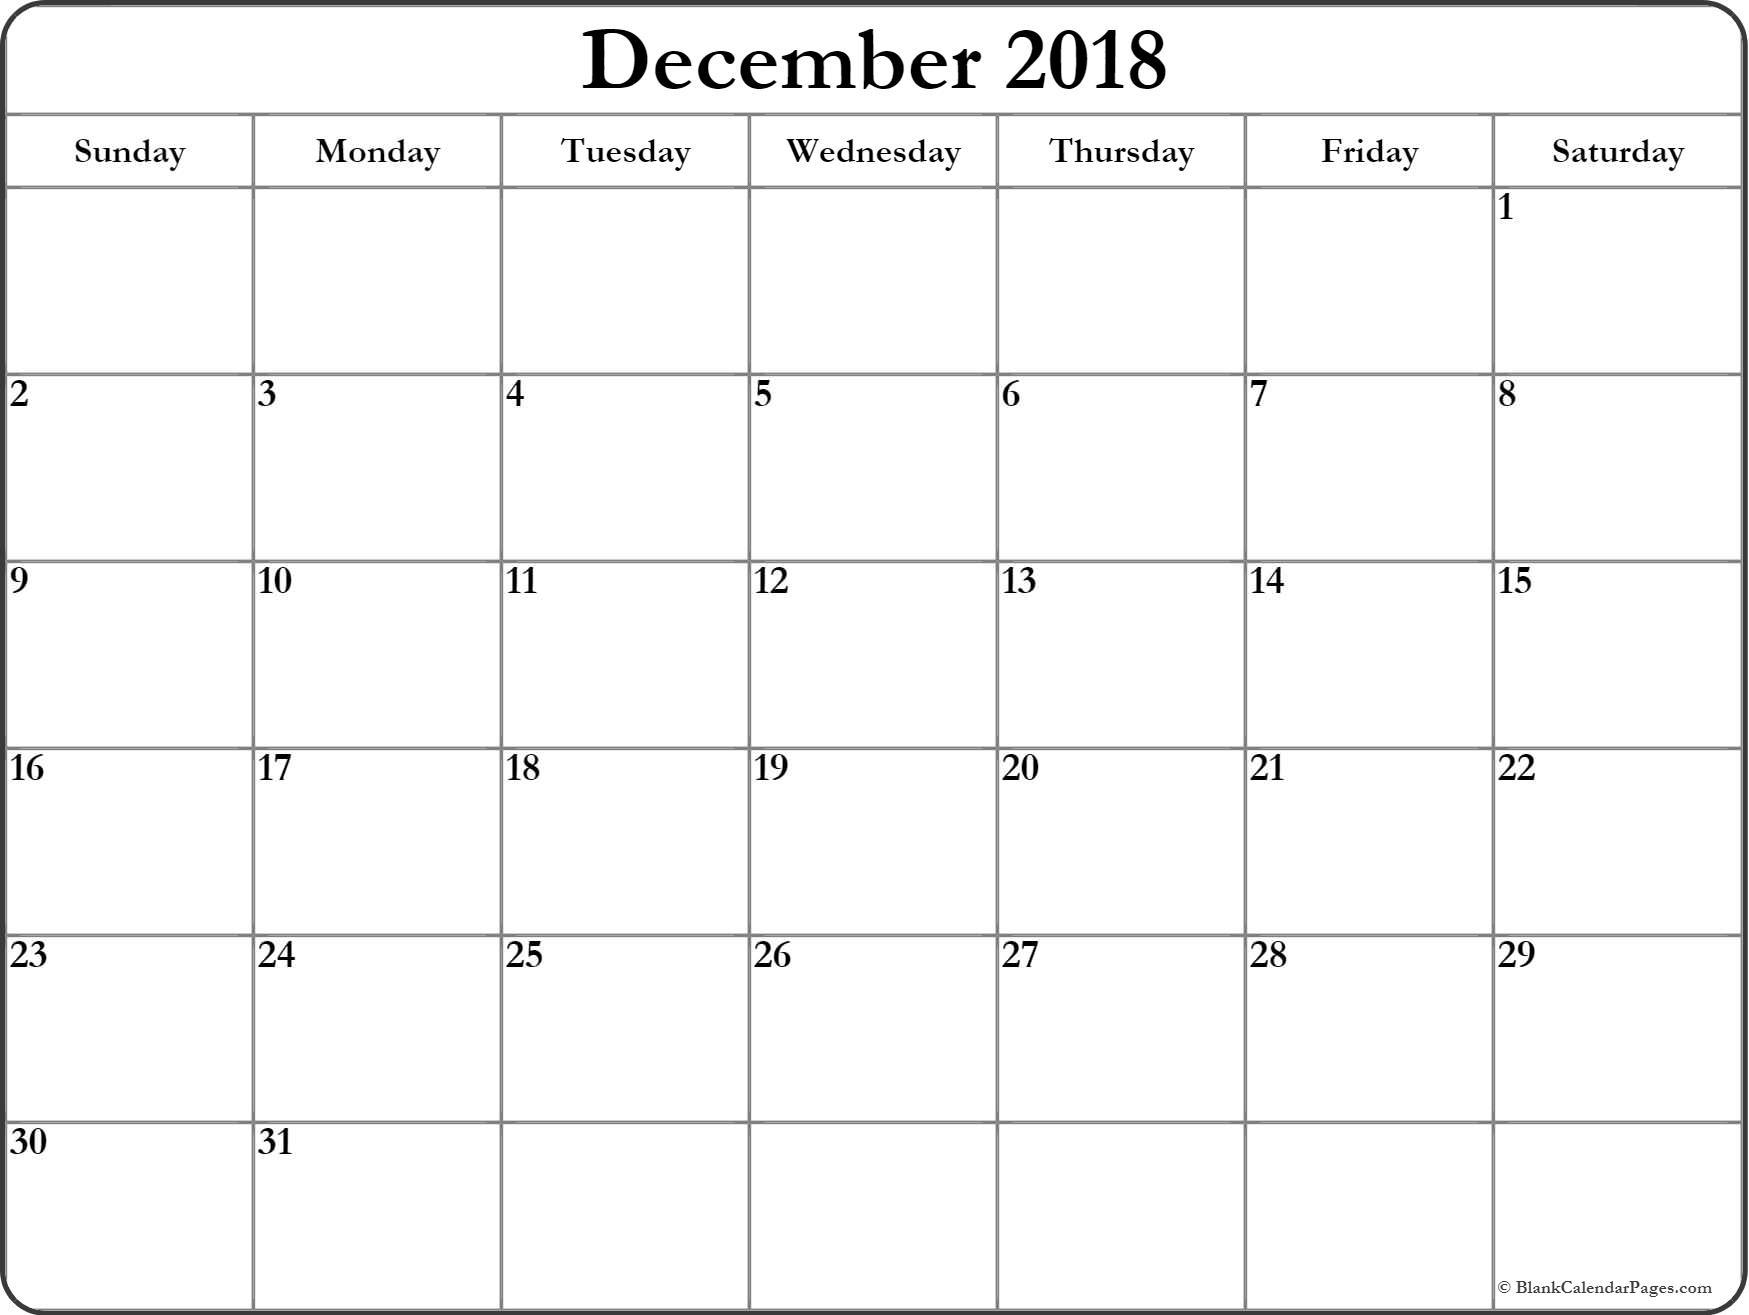 December 2018 Calendar   Free Printable Monthly Calendars regarding December Printable Monthly Calendar Templates